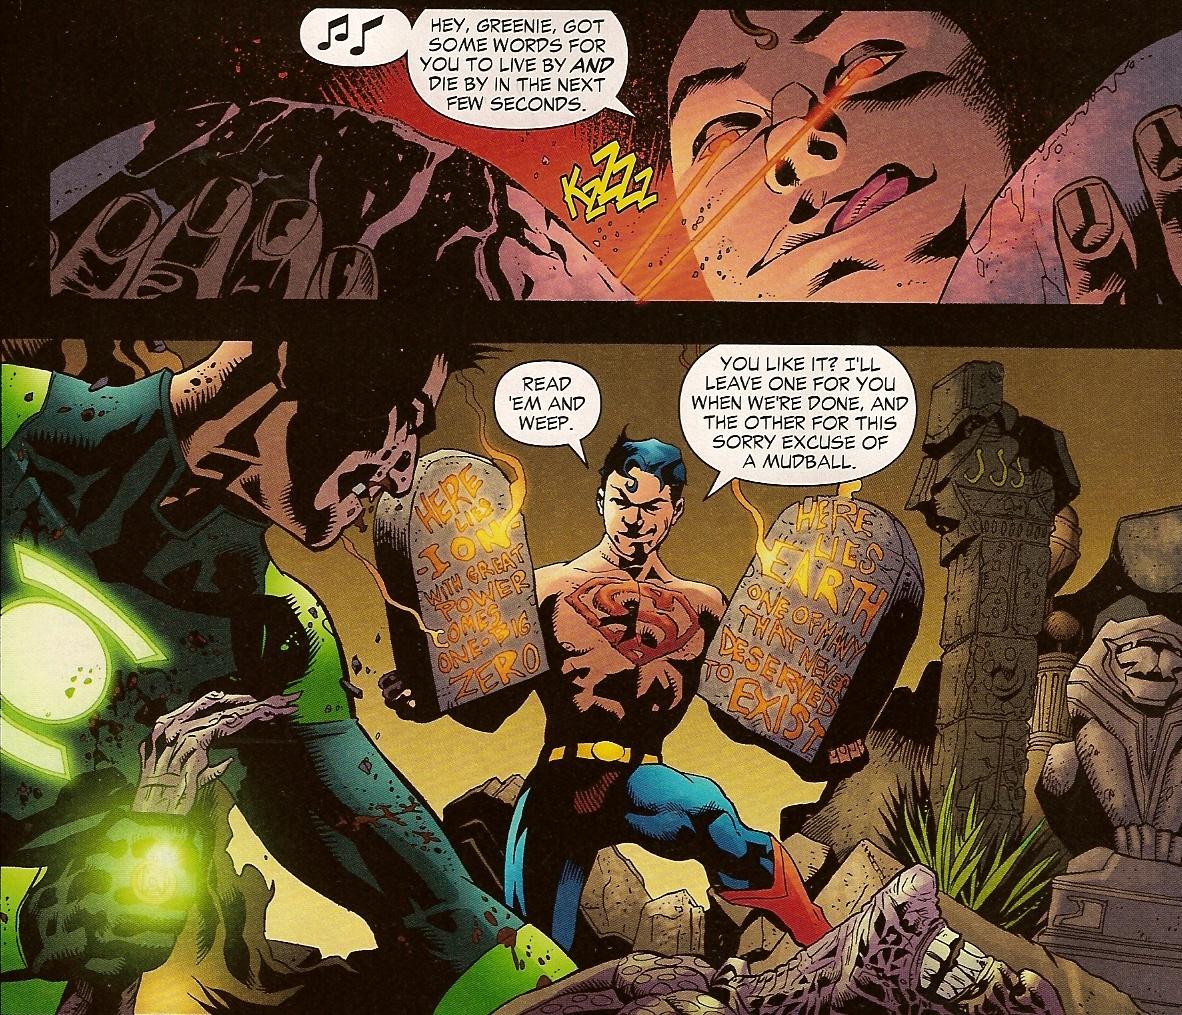 Guardian of the Universe, Guardian,Universe,Comic,toon,superboy,superman,kryptonite,Superboy Prime,Green ,Green Lantern,Red Sun, selfdestruction,badass